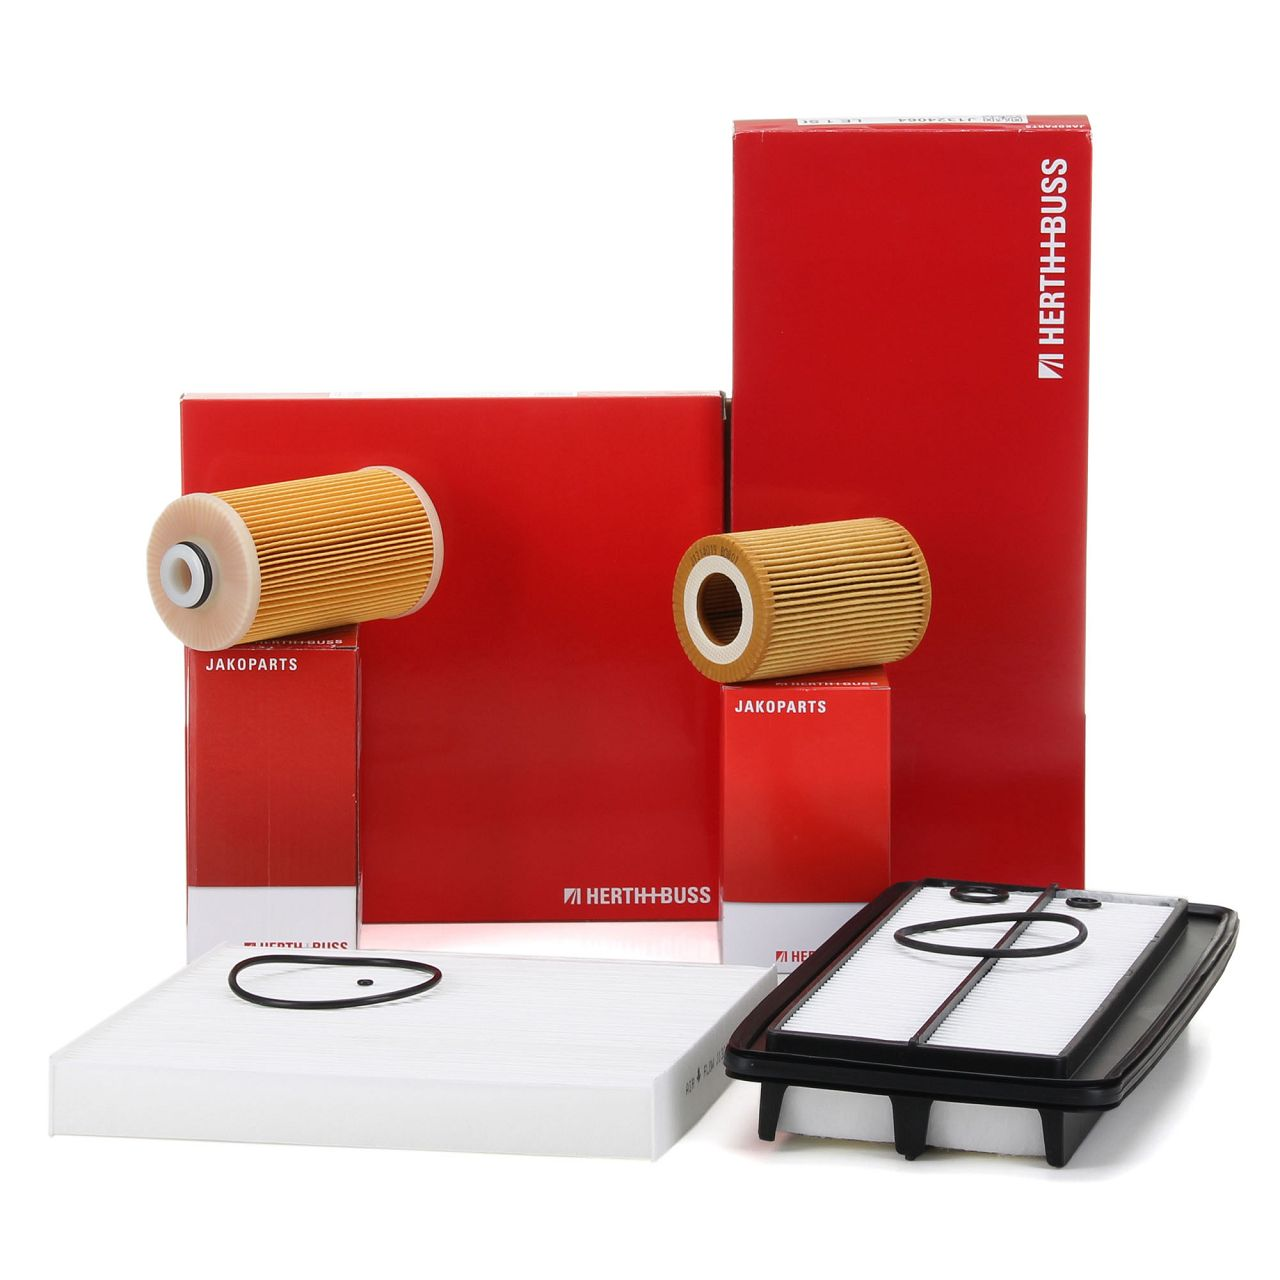 HERTH+BUSS JAKOPARTS Inspektionskit für HONDA ACCORD VIII 2.2 i-DTEC 150/180 PS